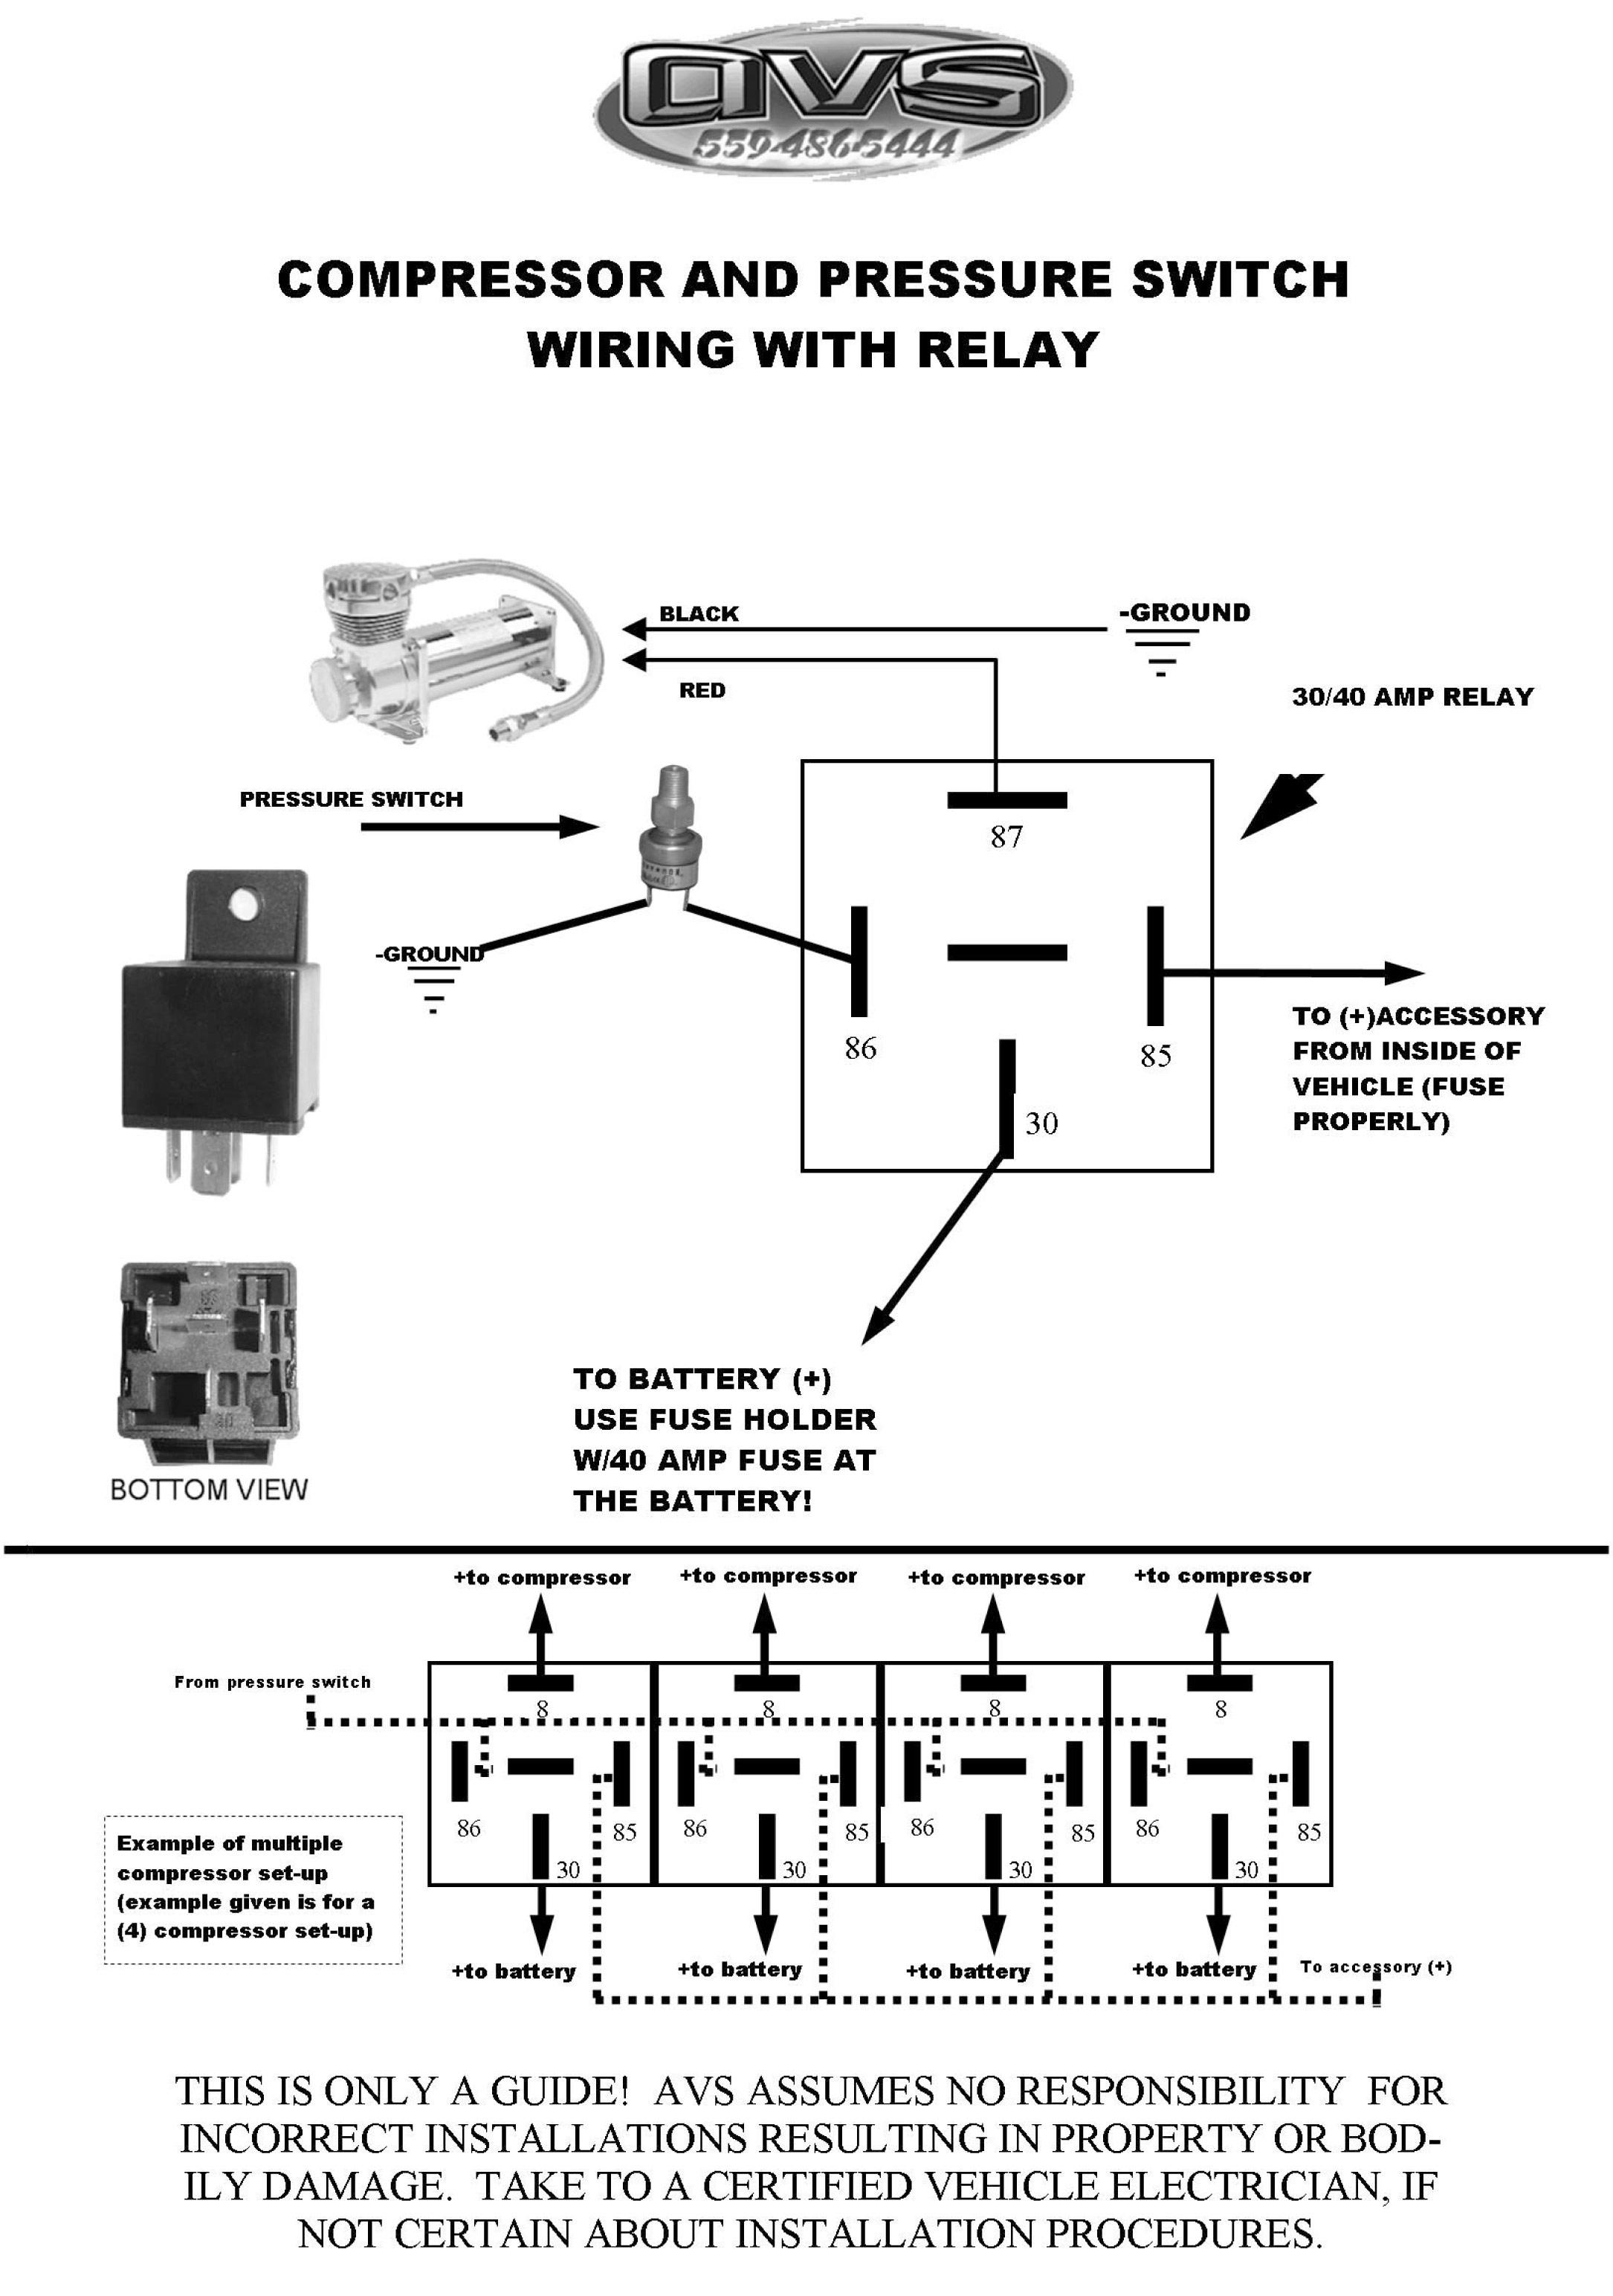 Single Compressor Wiring Kit